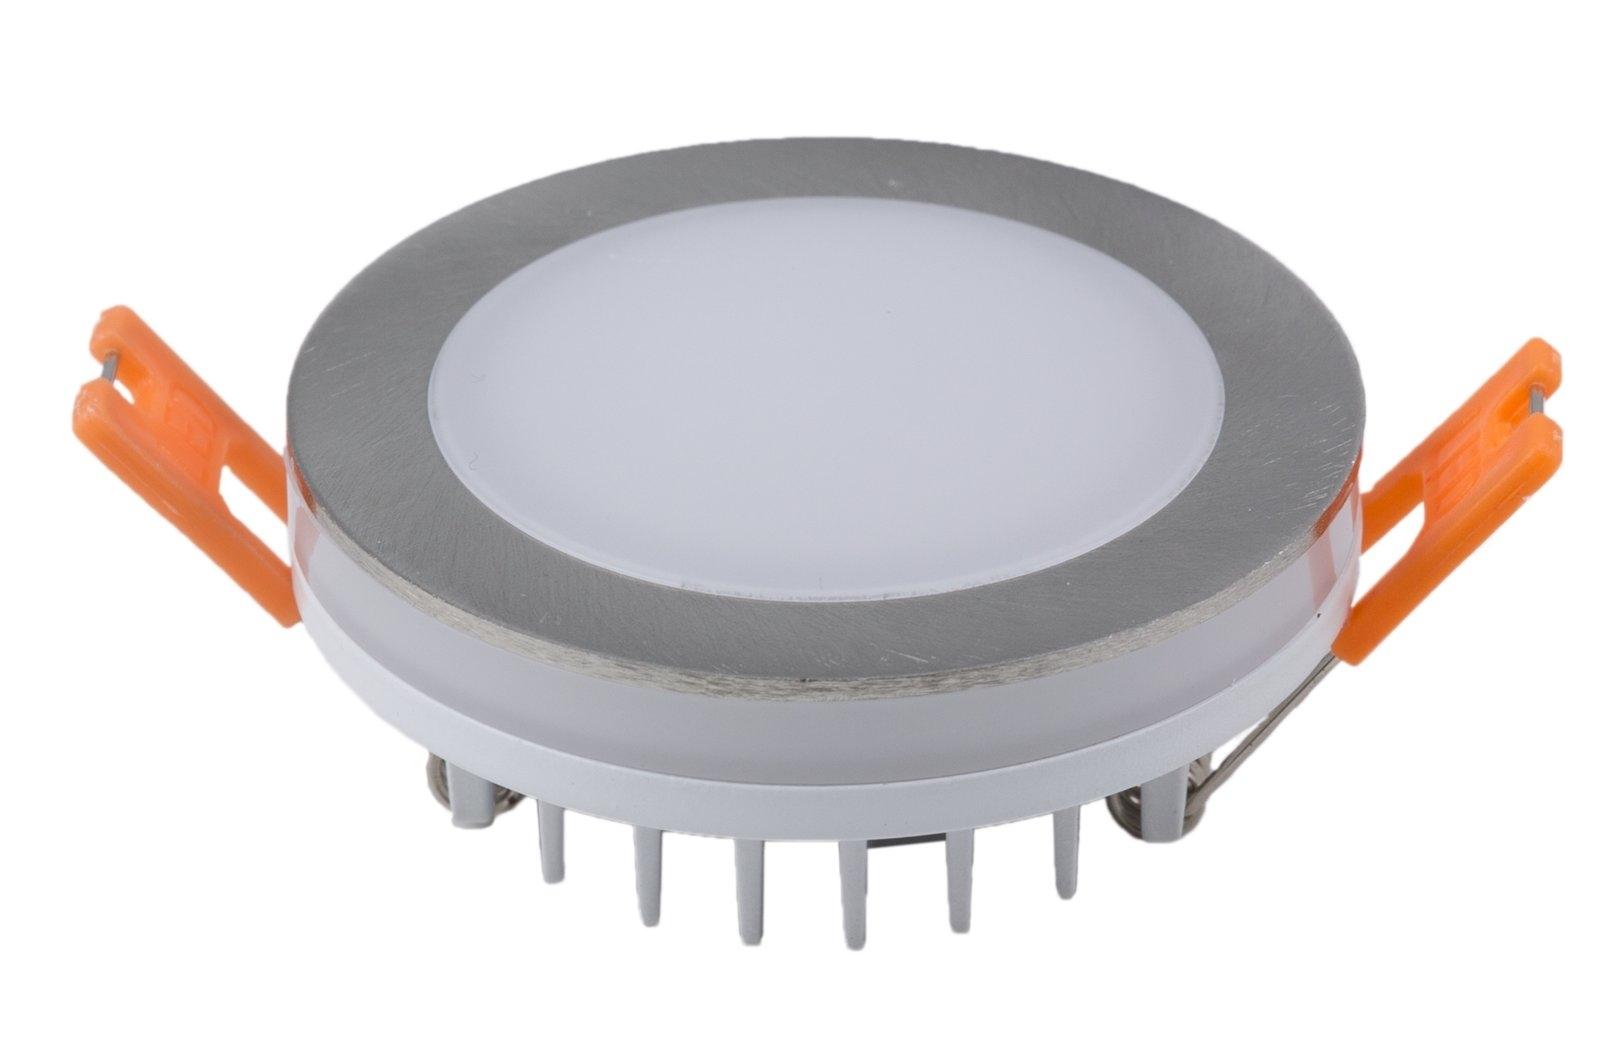 Heitronic Bodeneinbaustrahler LED EINBAUSTRAHLER 6W WW+LICHTKRANZ NICKEL-MATT, 27769